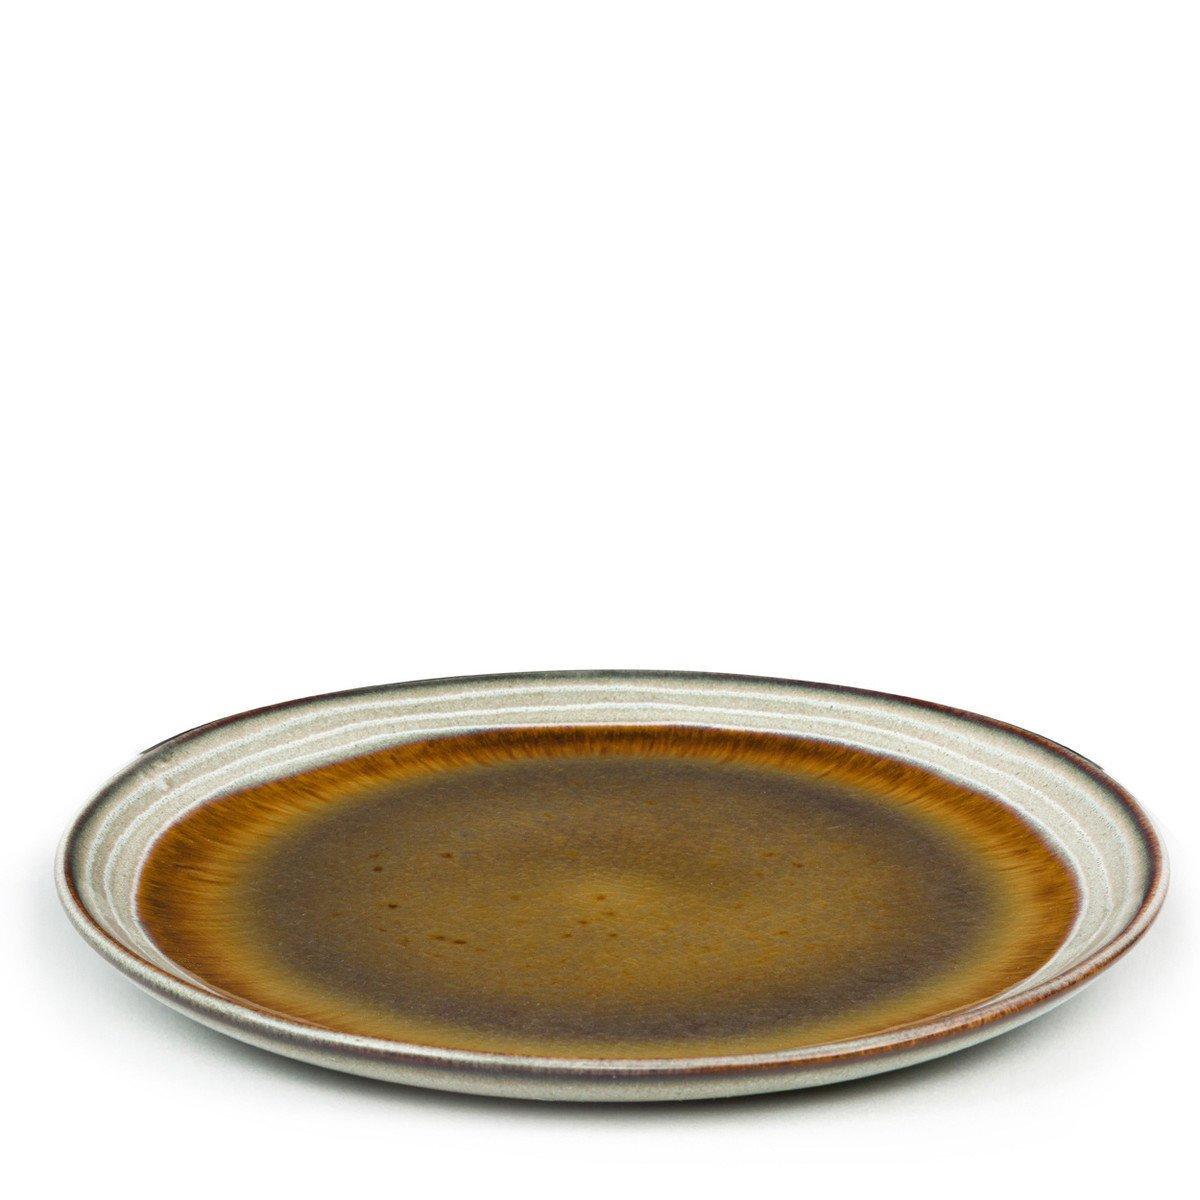 Bazar Bizar Salat Teller The Comporta